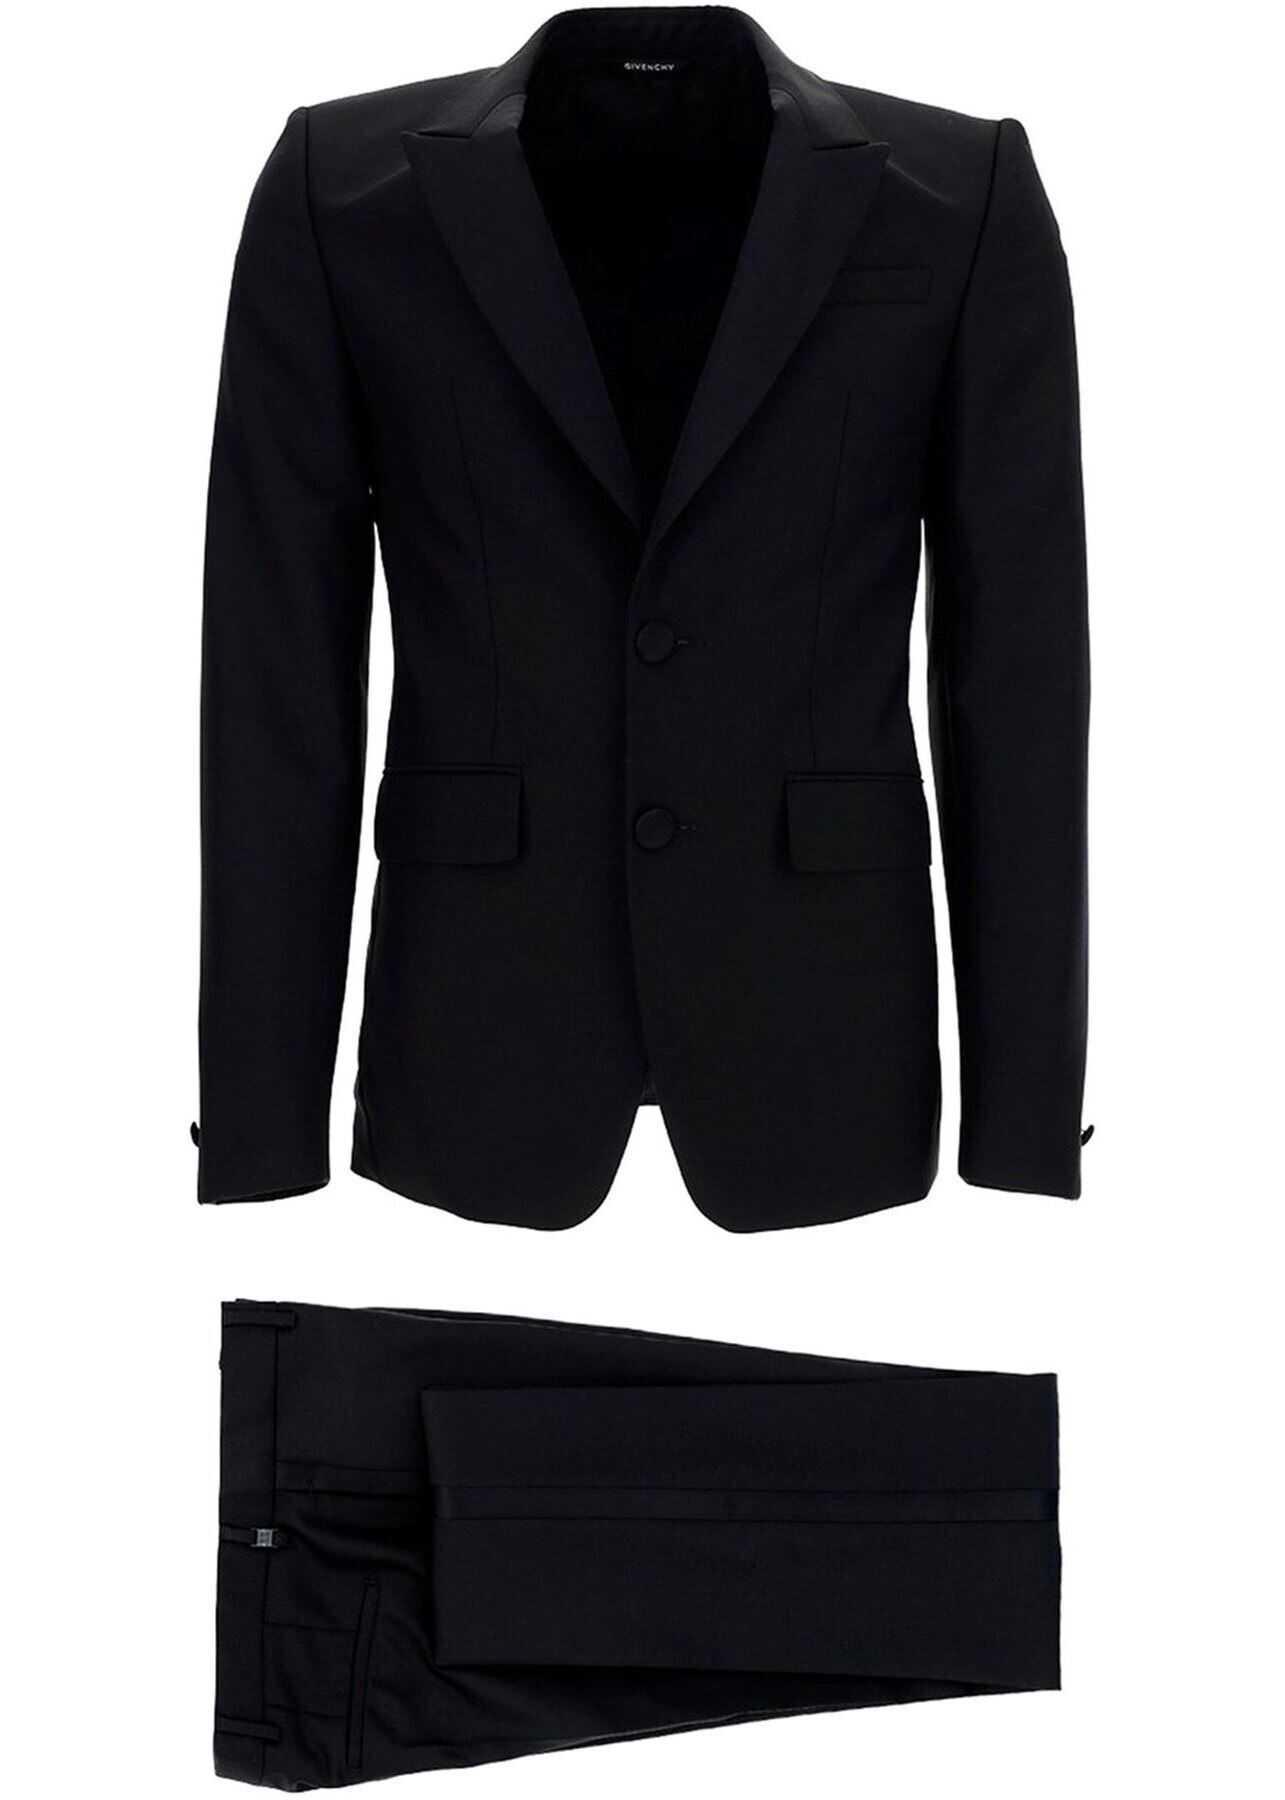 Wool-Mohair Blend Tuxedo In Black